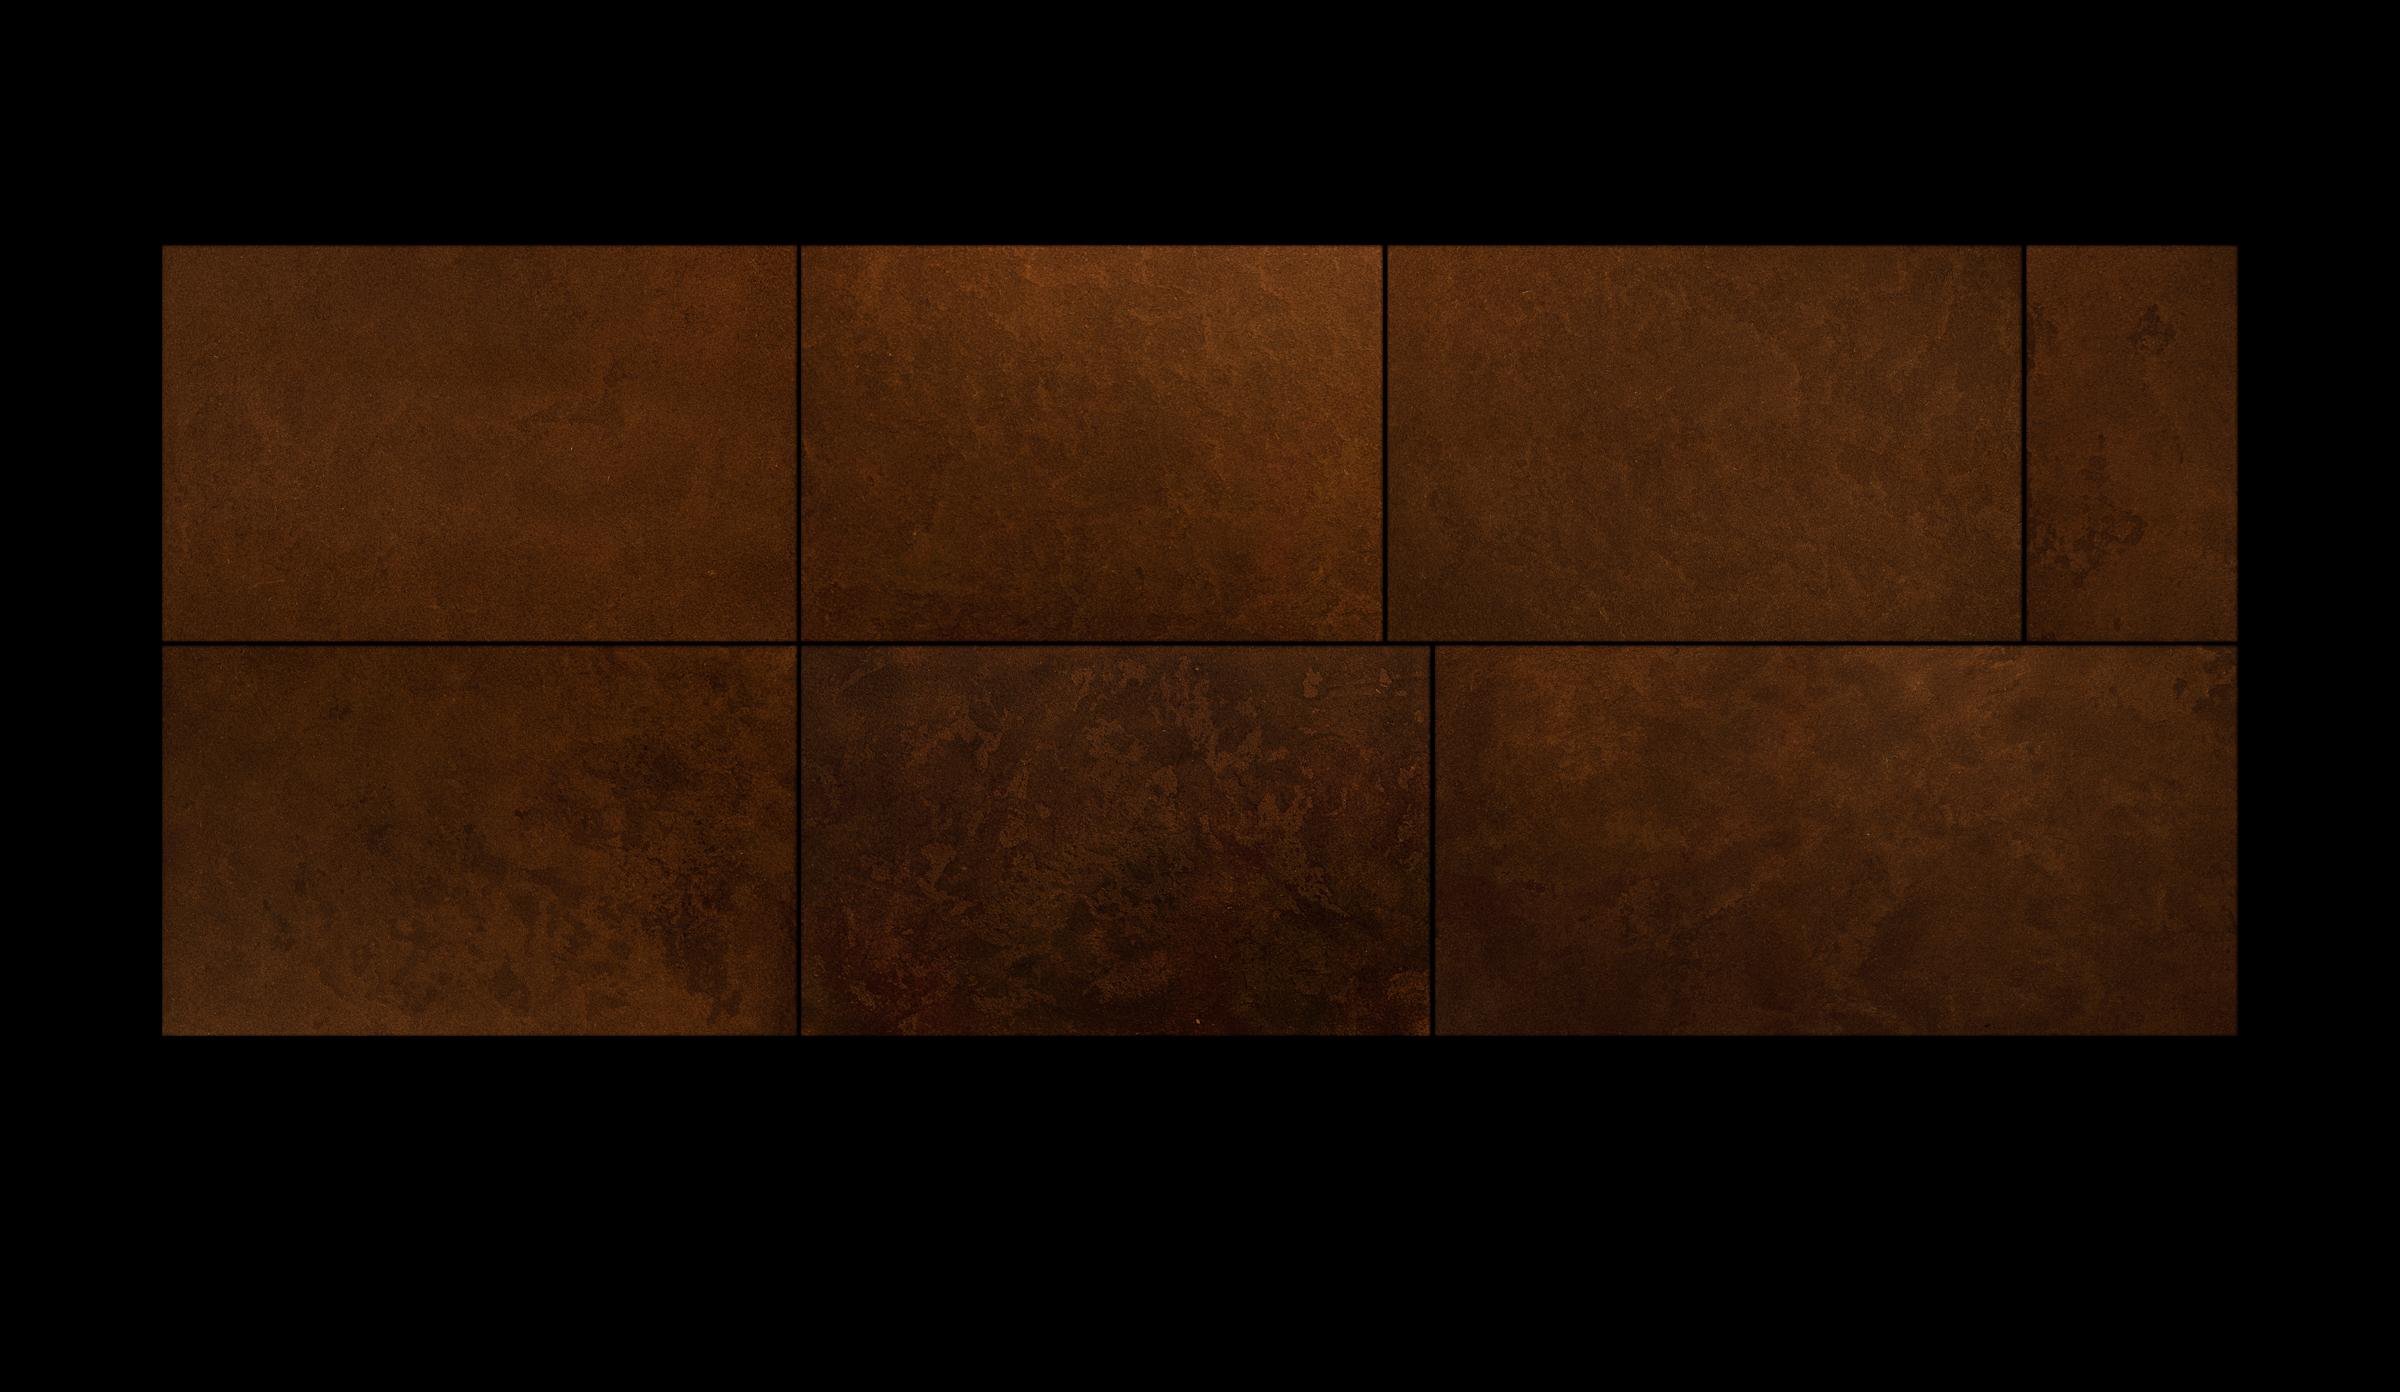 Peat-Plaster-Panels-pic-2.jpg